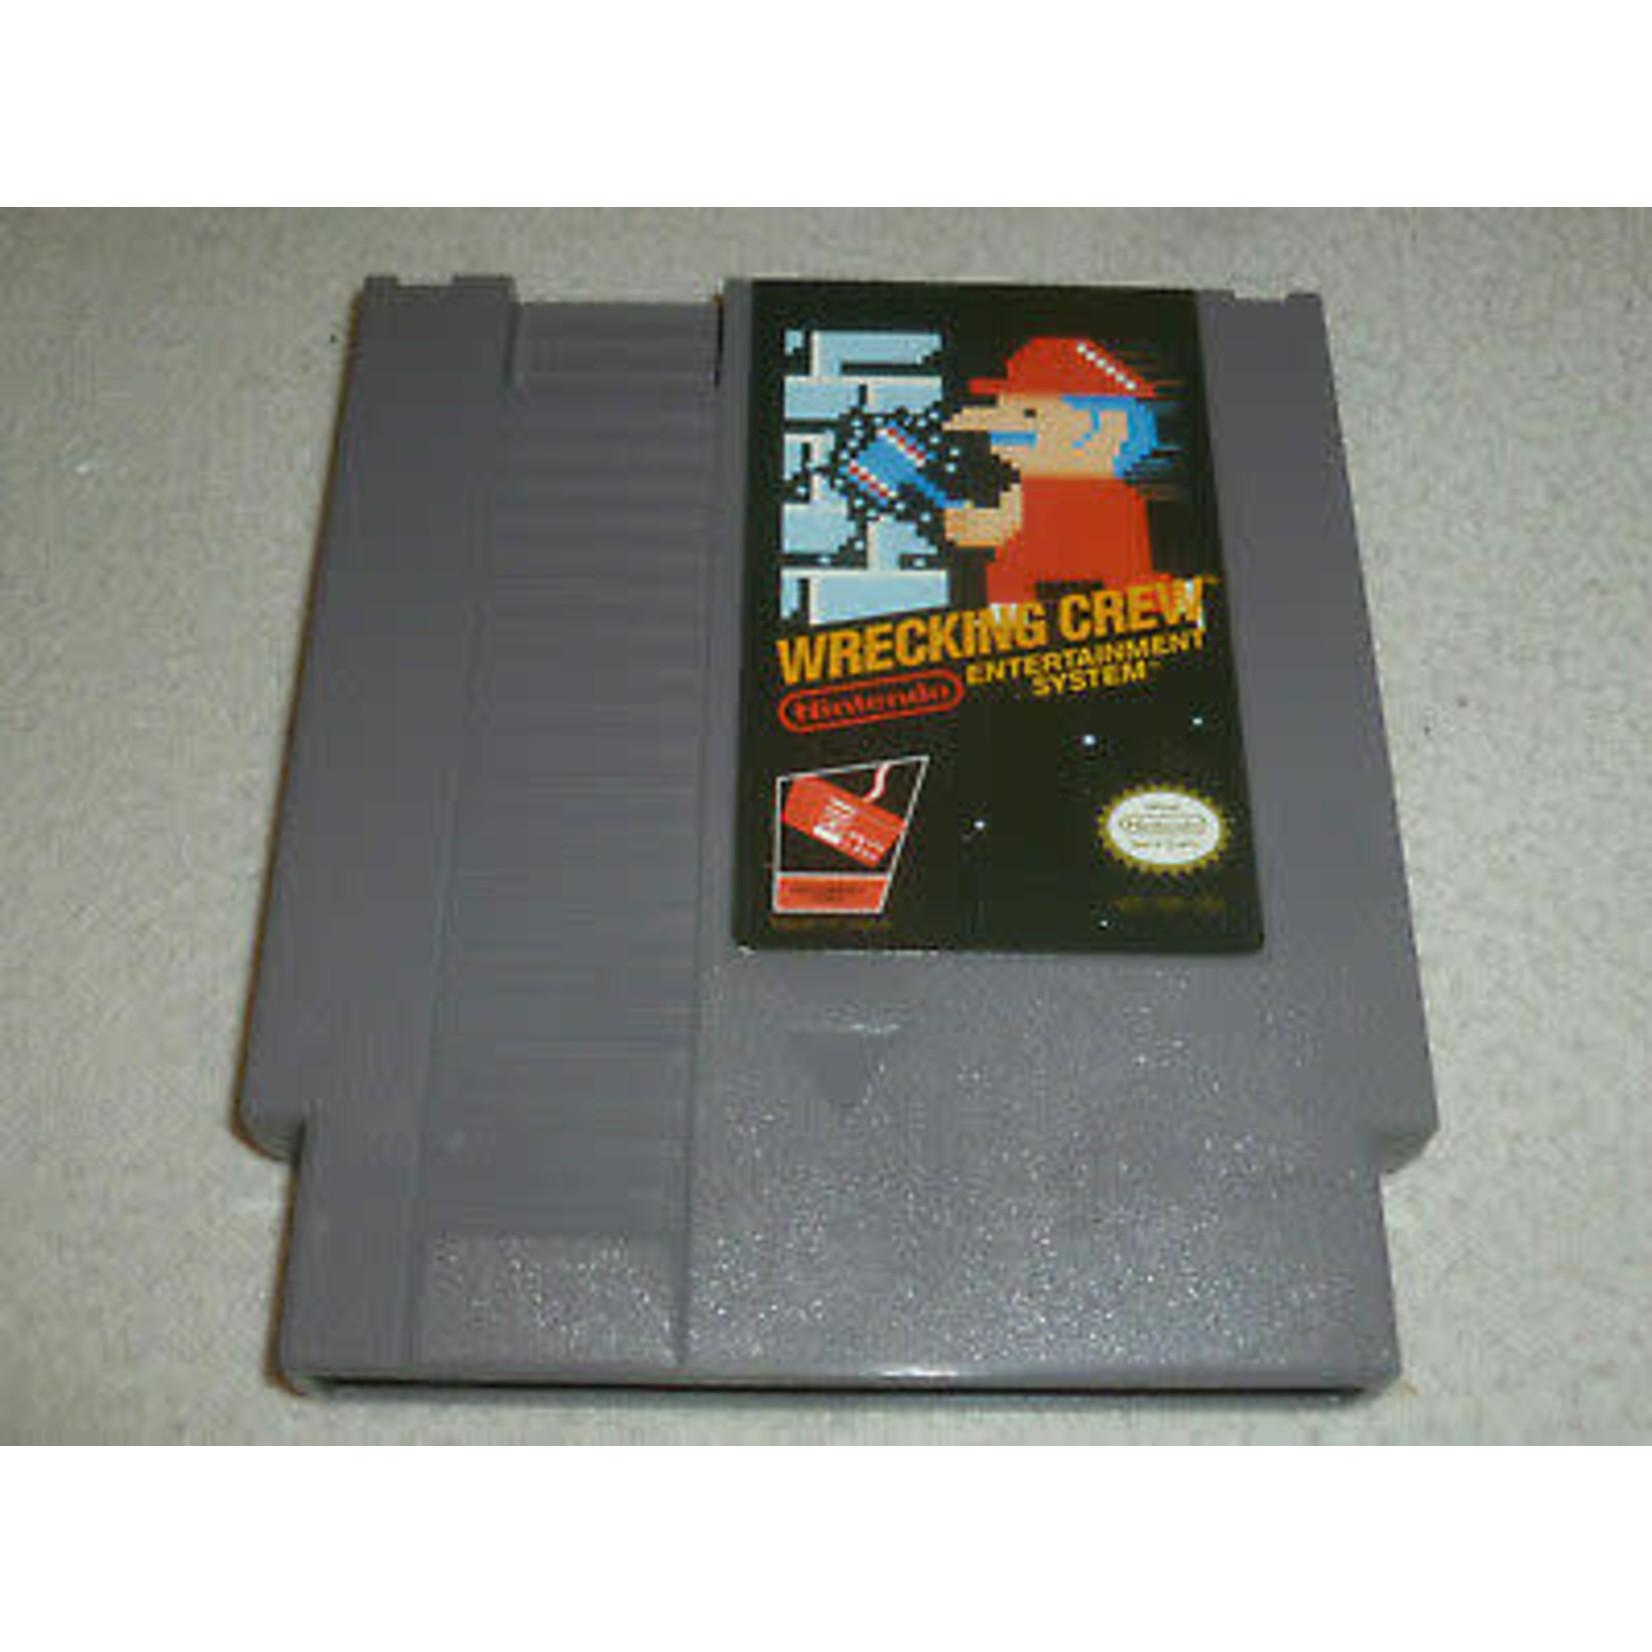 NESU-Wrecking Crew (cartridge)